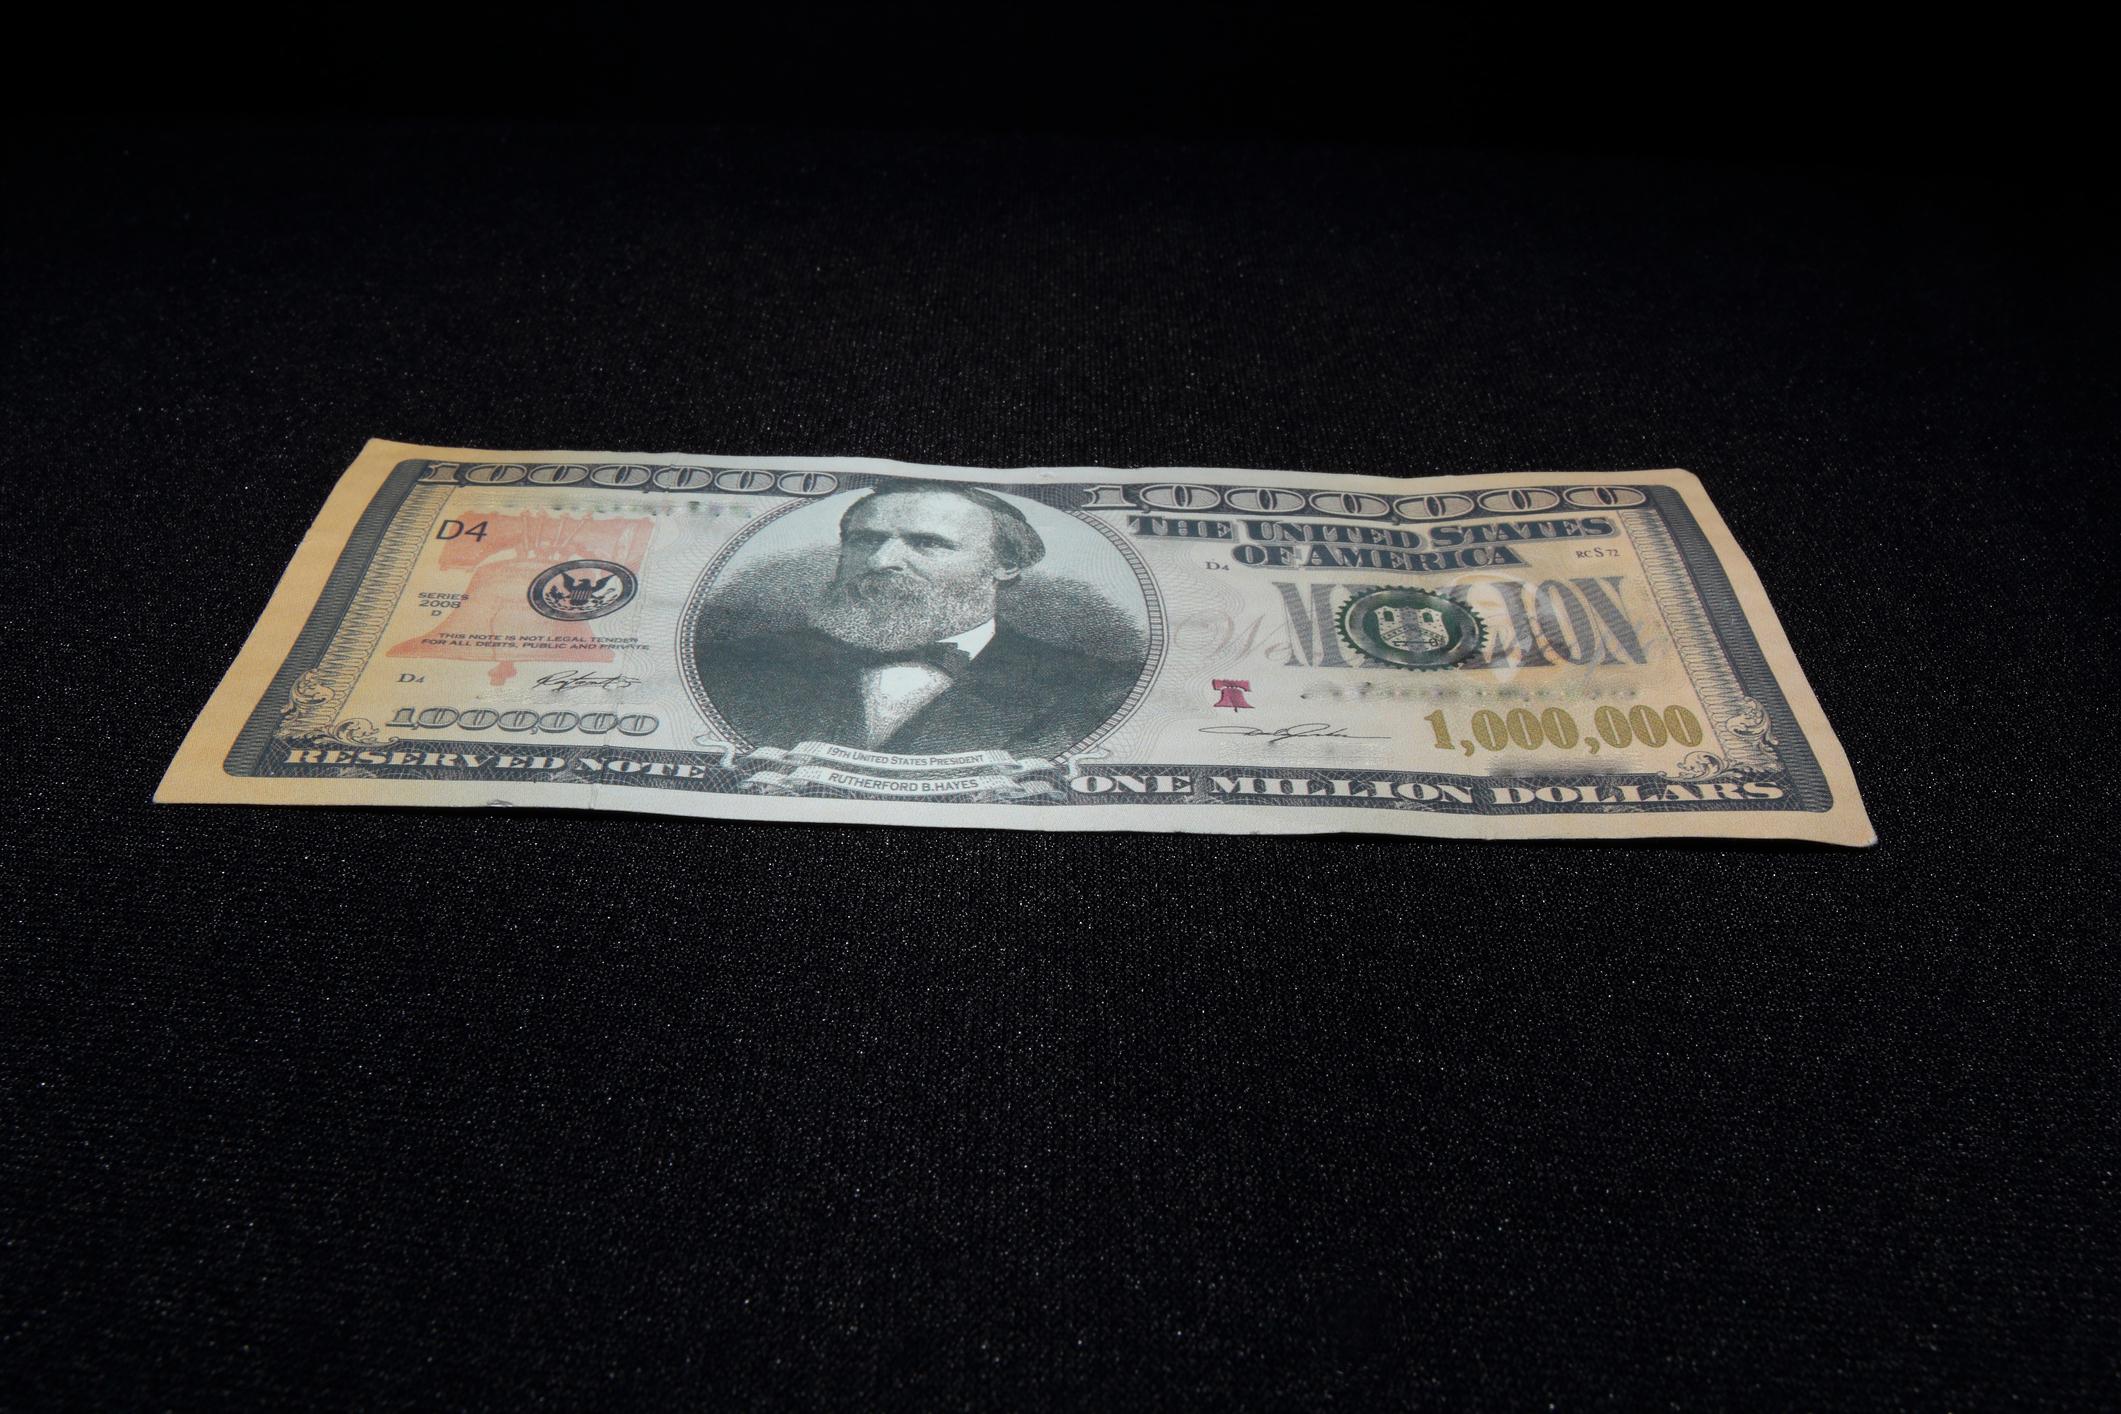 A fake $1,000,000 bill